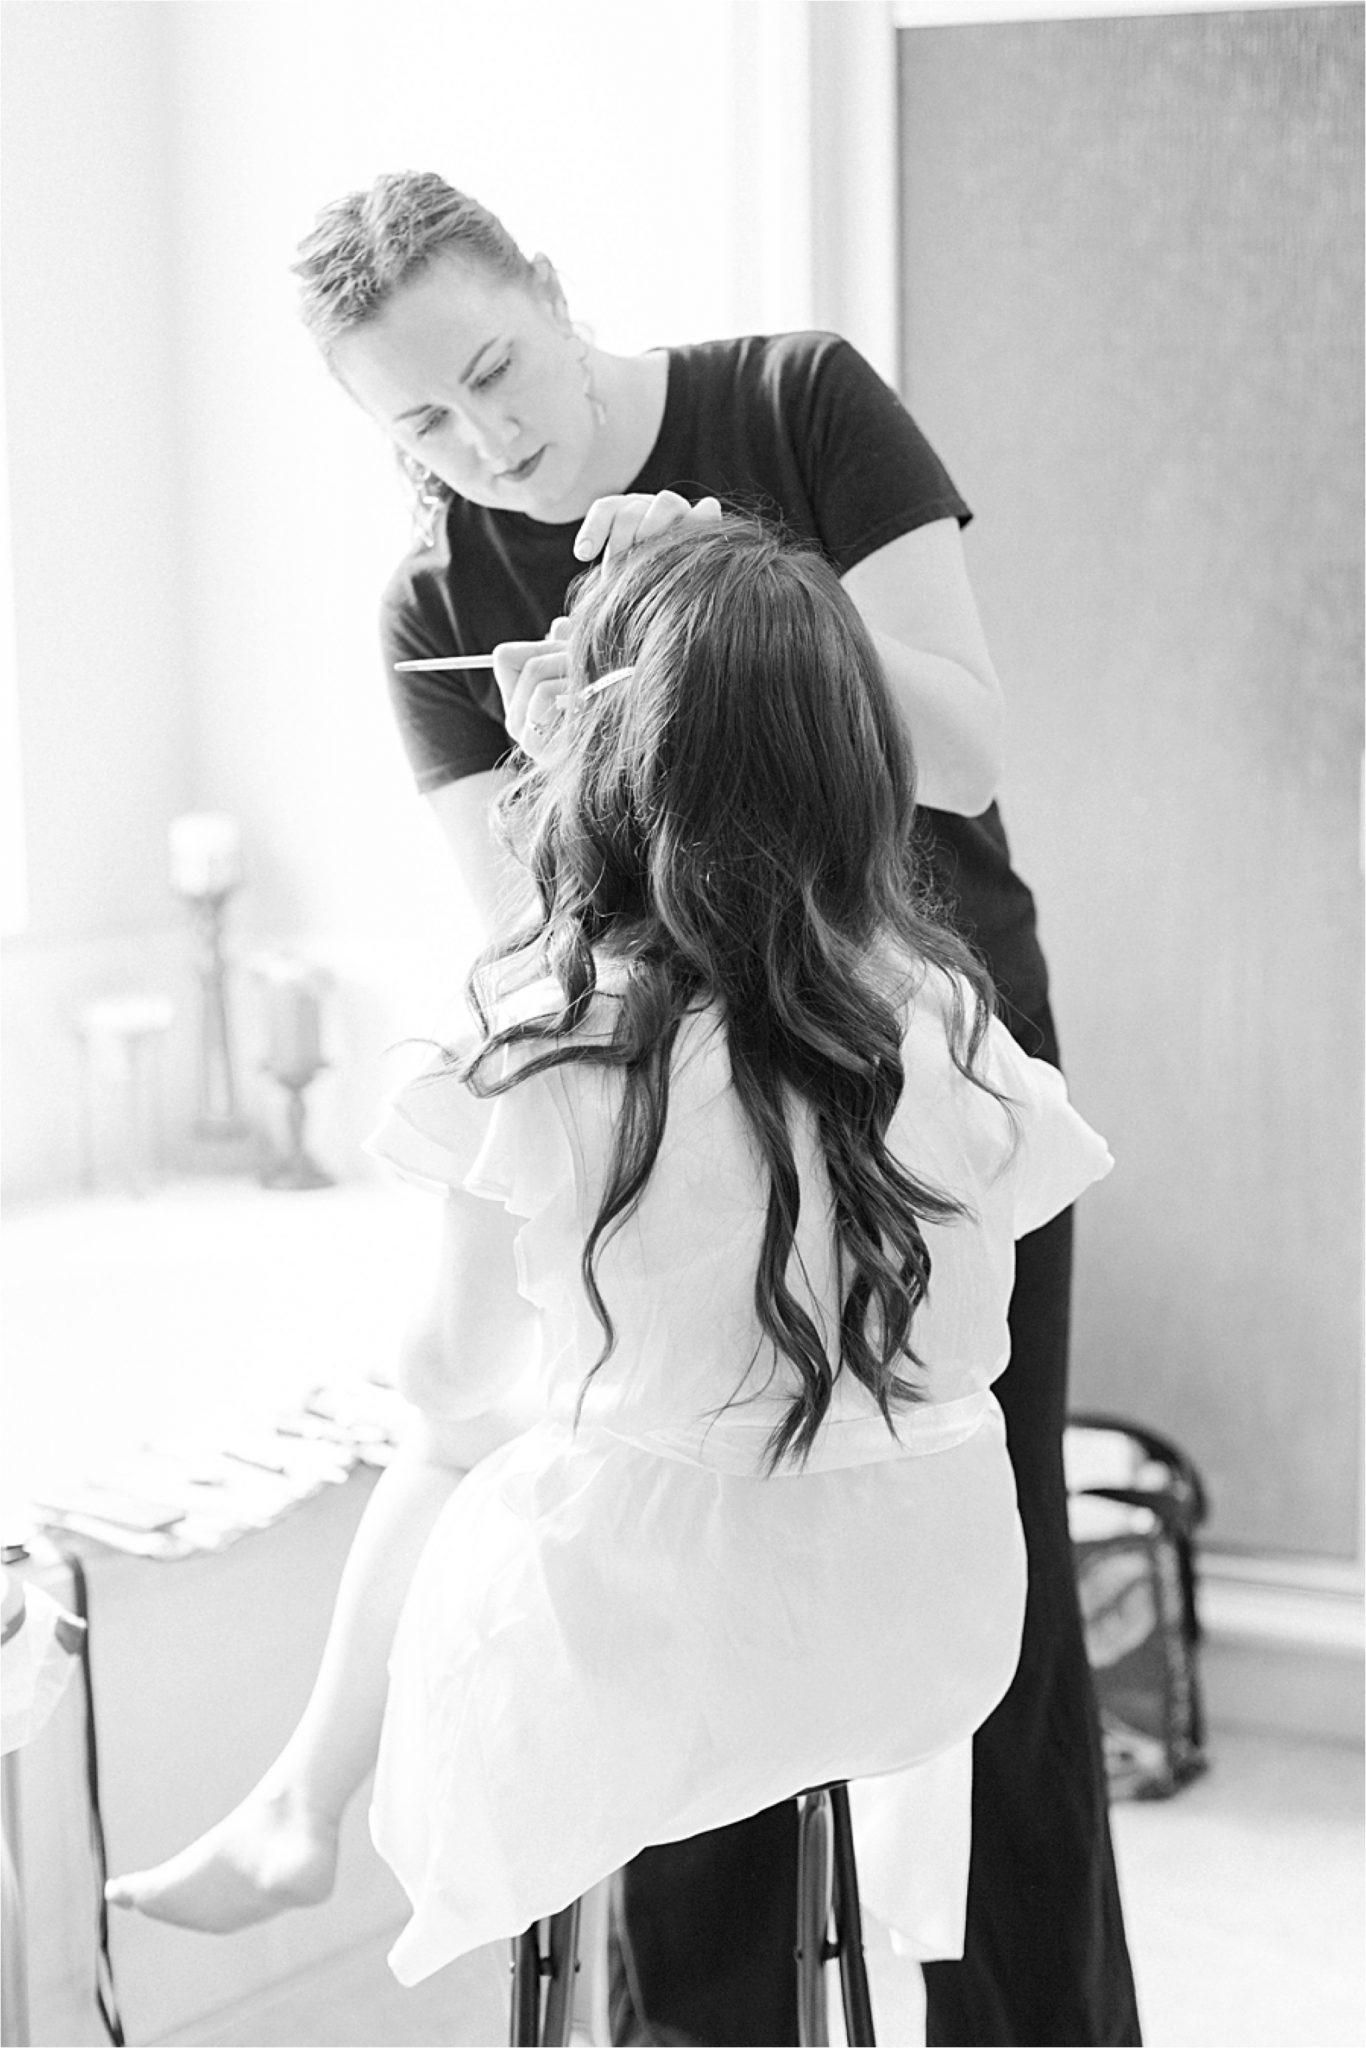 Bridal makeup-getting ready-wedding day-bride-makeup artist-wedding photography-Alabama